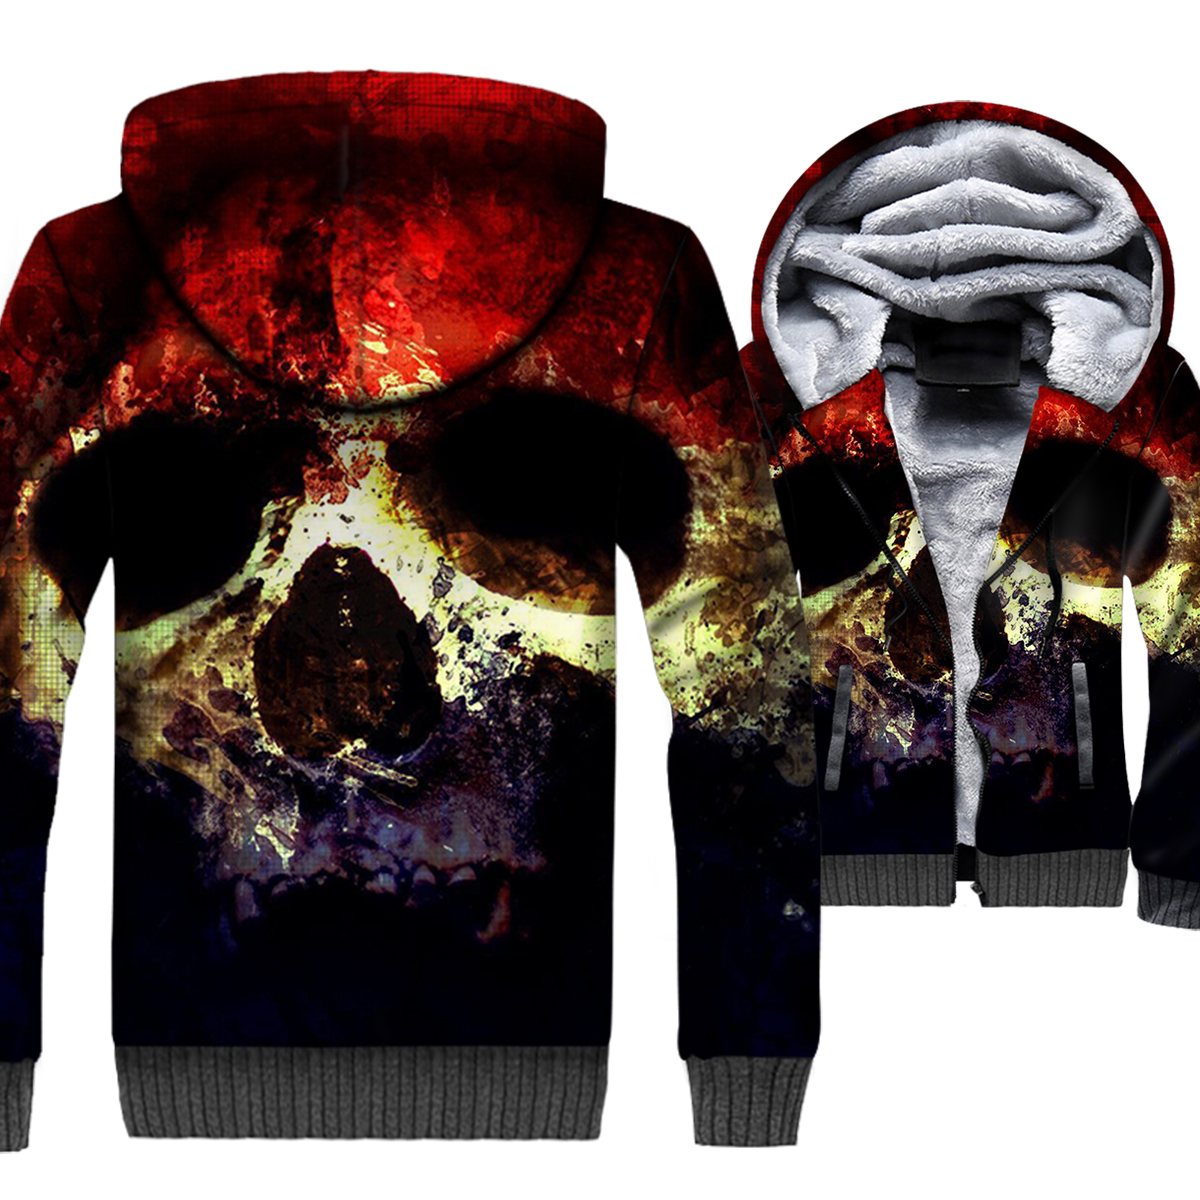 Skull 3D Jacket Men Punk Harajuku Hoodies Crossfit Sweatshirt 2018 New Design Winter Thick Fleece Warm Coat Brand Clothing Mens